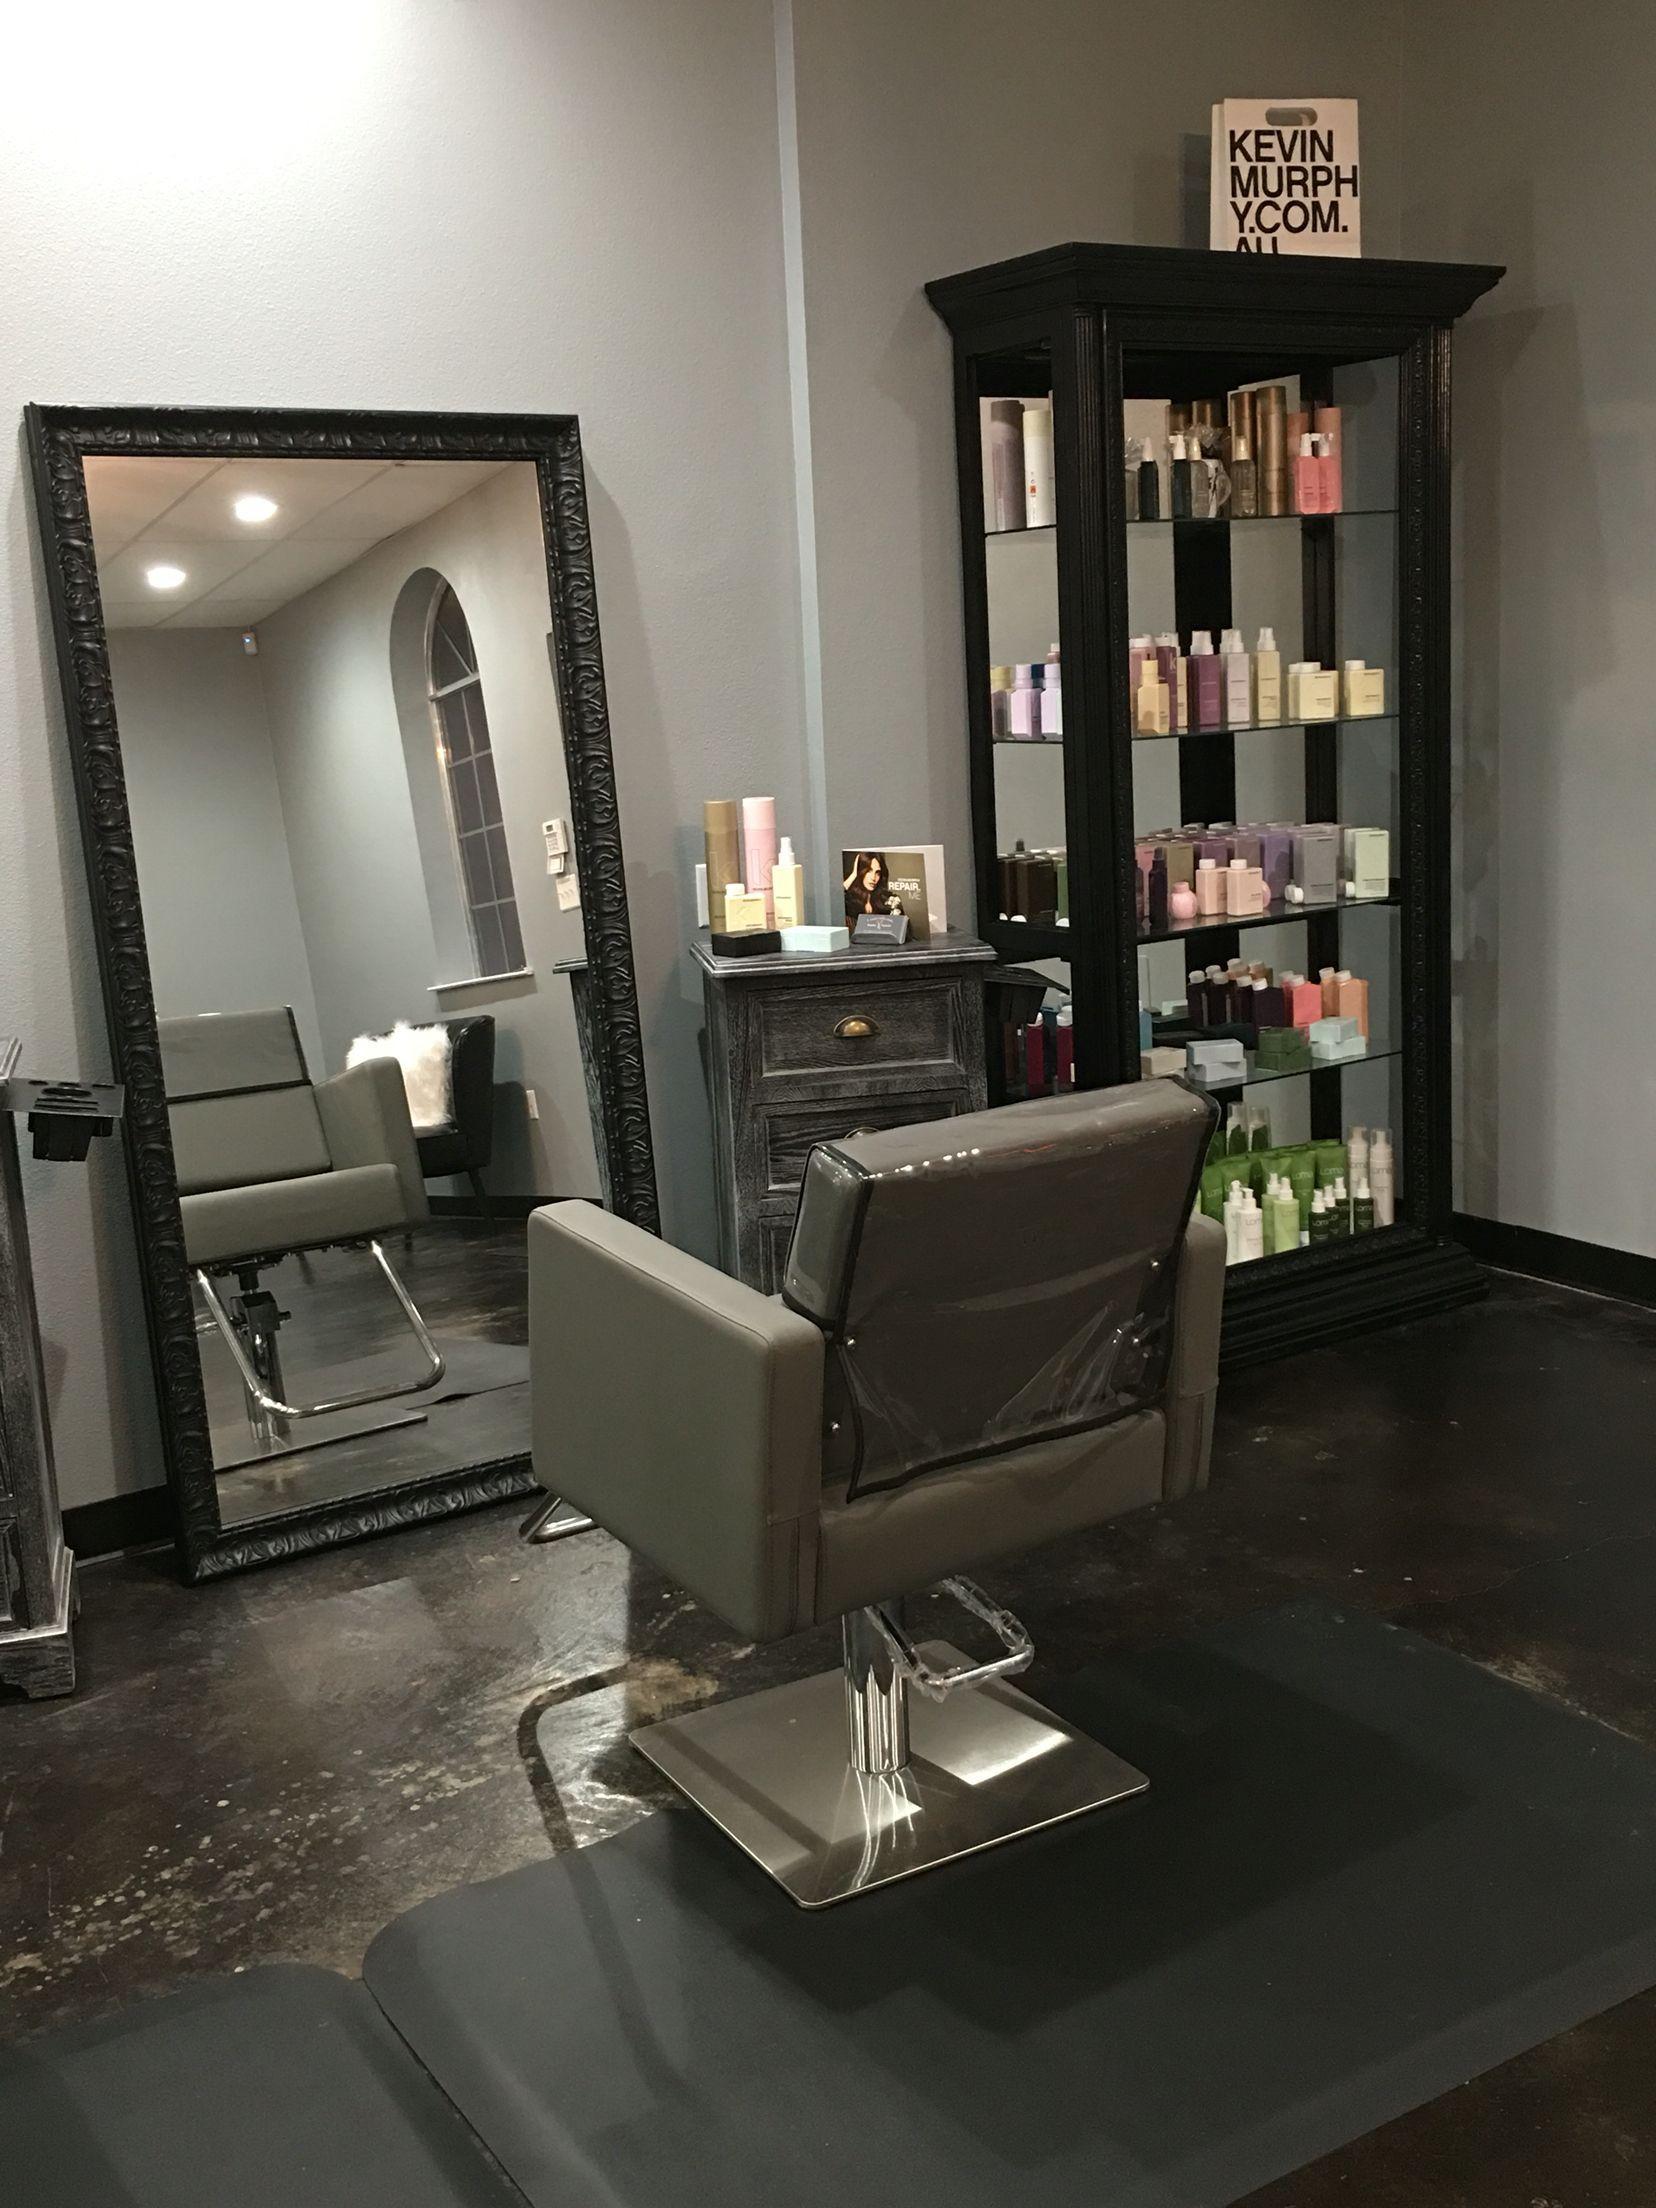 B Mariesalonstudio Kevinmurphysalon Loma Modernsalon Hammondla Hairlife In 2020 Salon Suites Decor Salon Decor Studio Salon Interior Design,Front Hand Full Hand Easy Simple Mehndi Designs For Kids